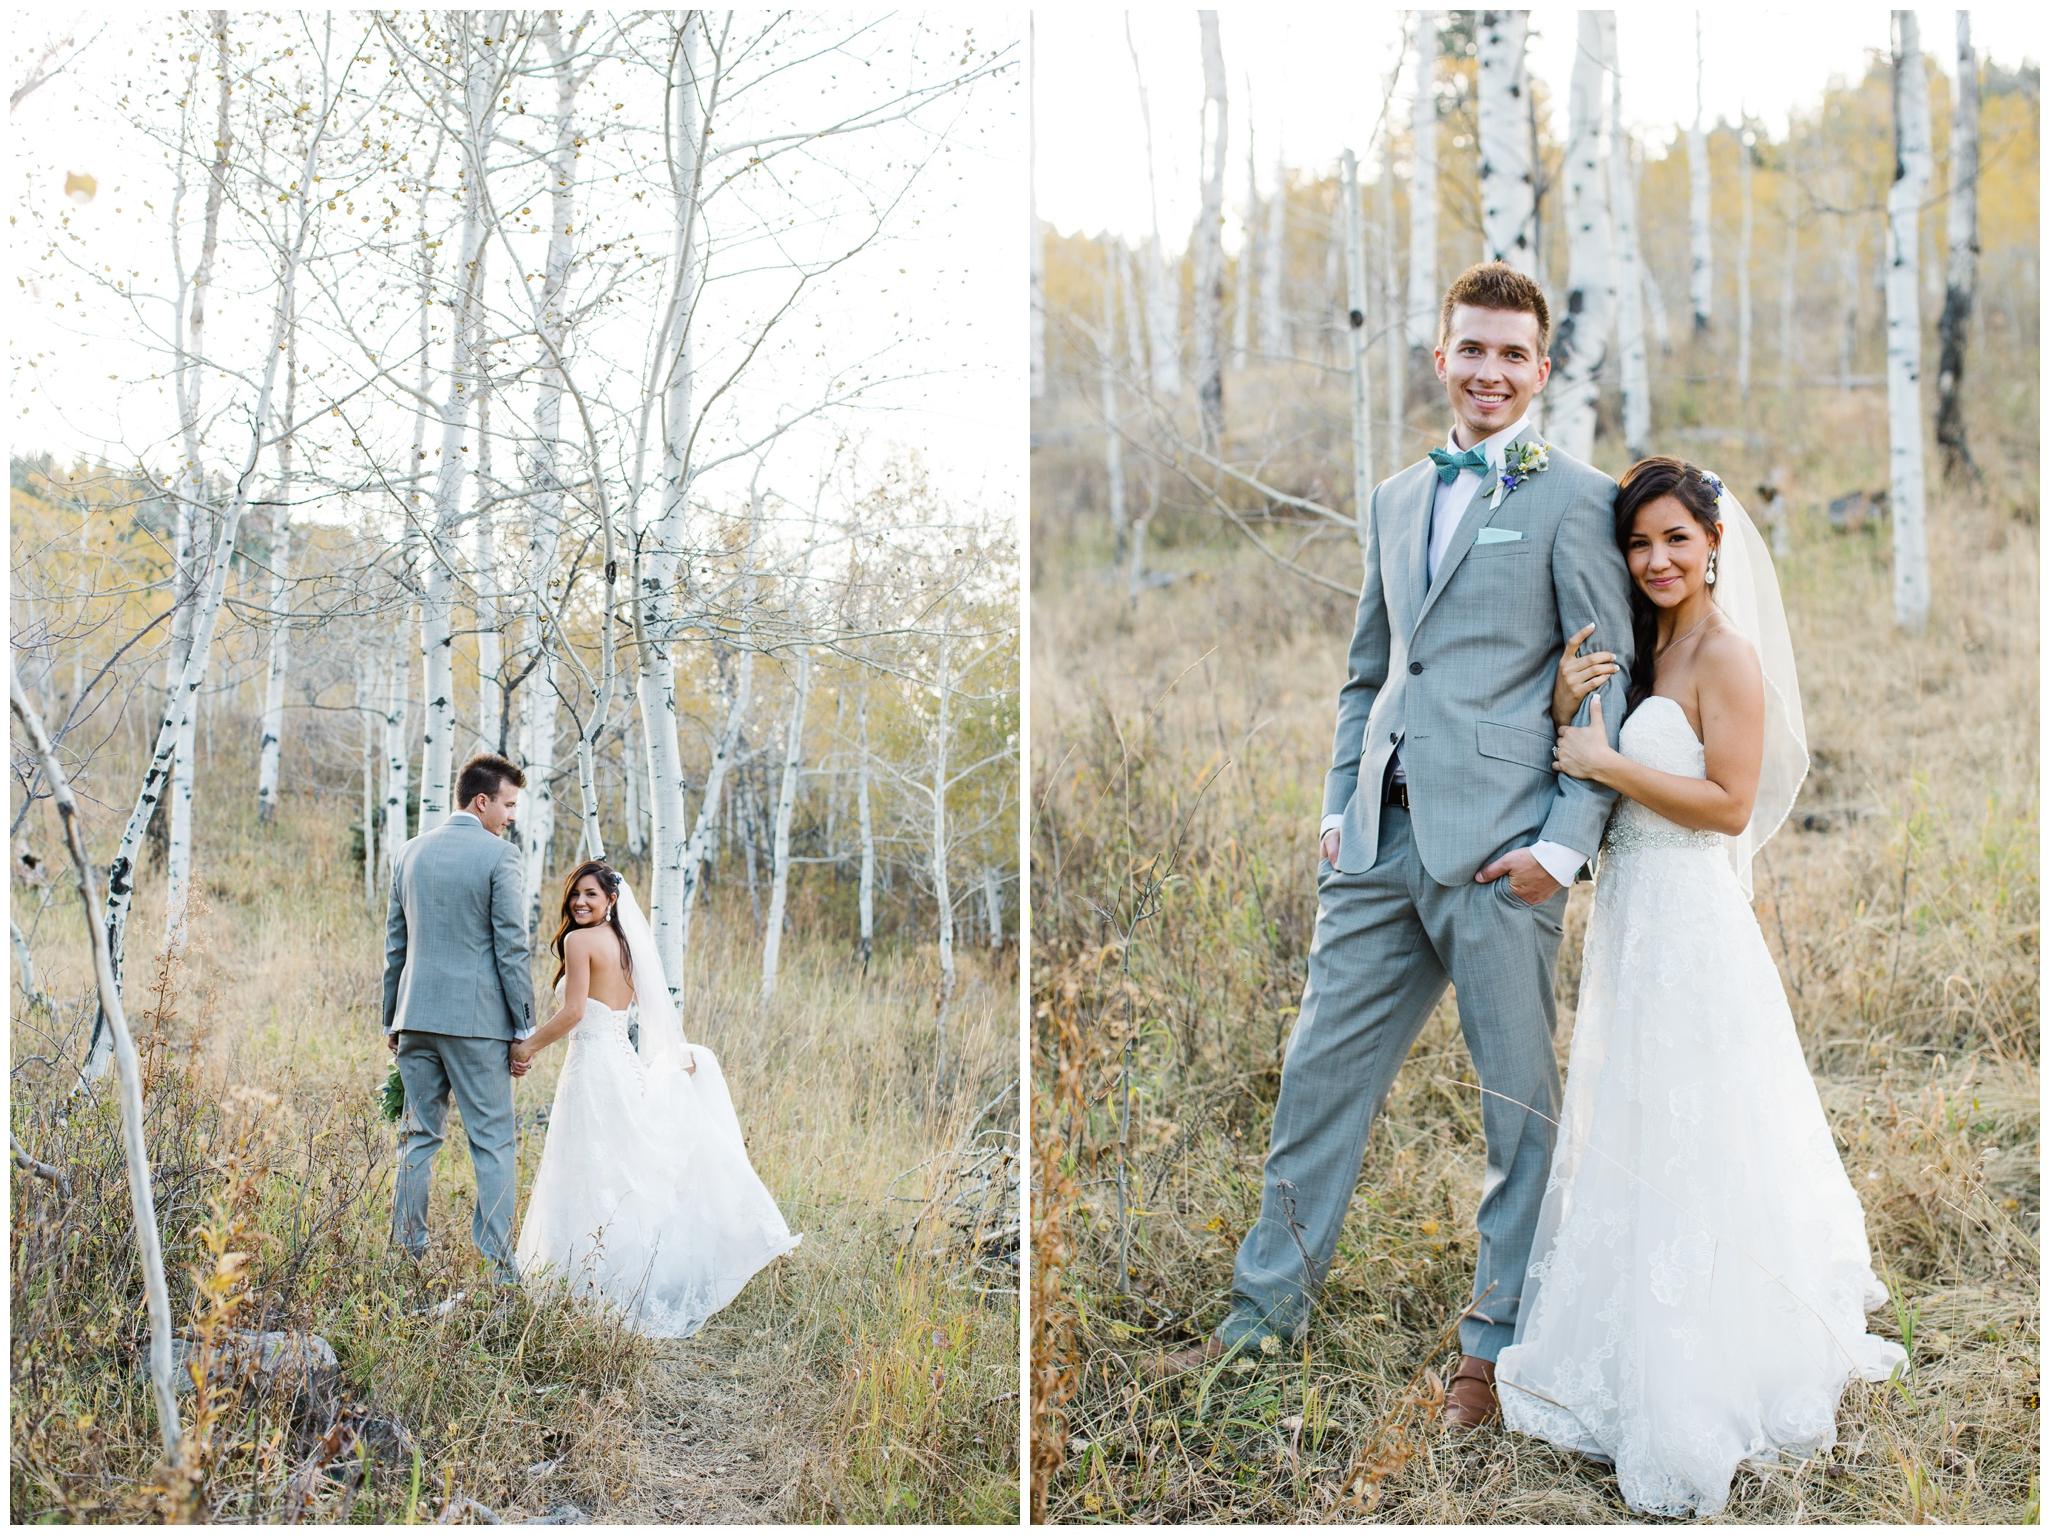 TysonHolly_Wedding_074.jpg